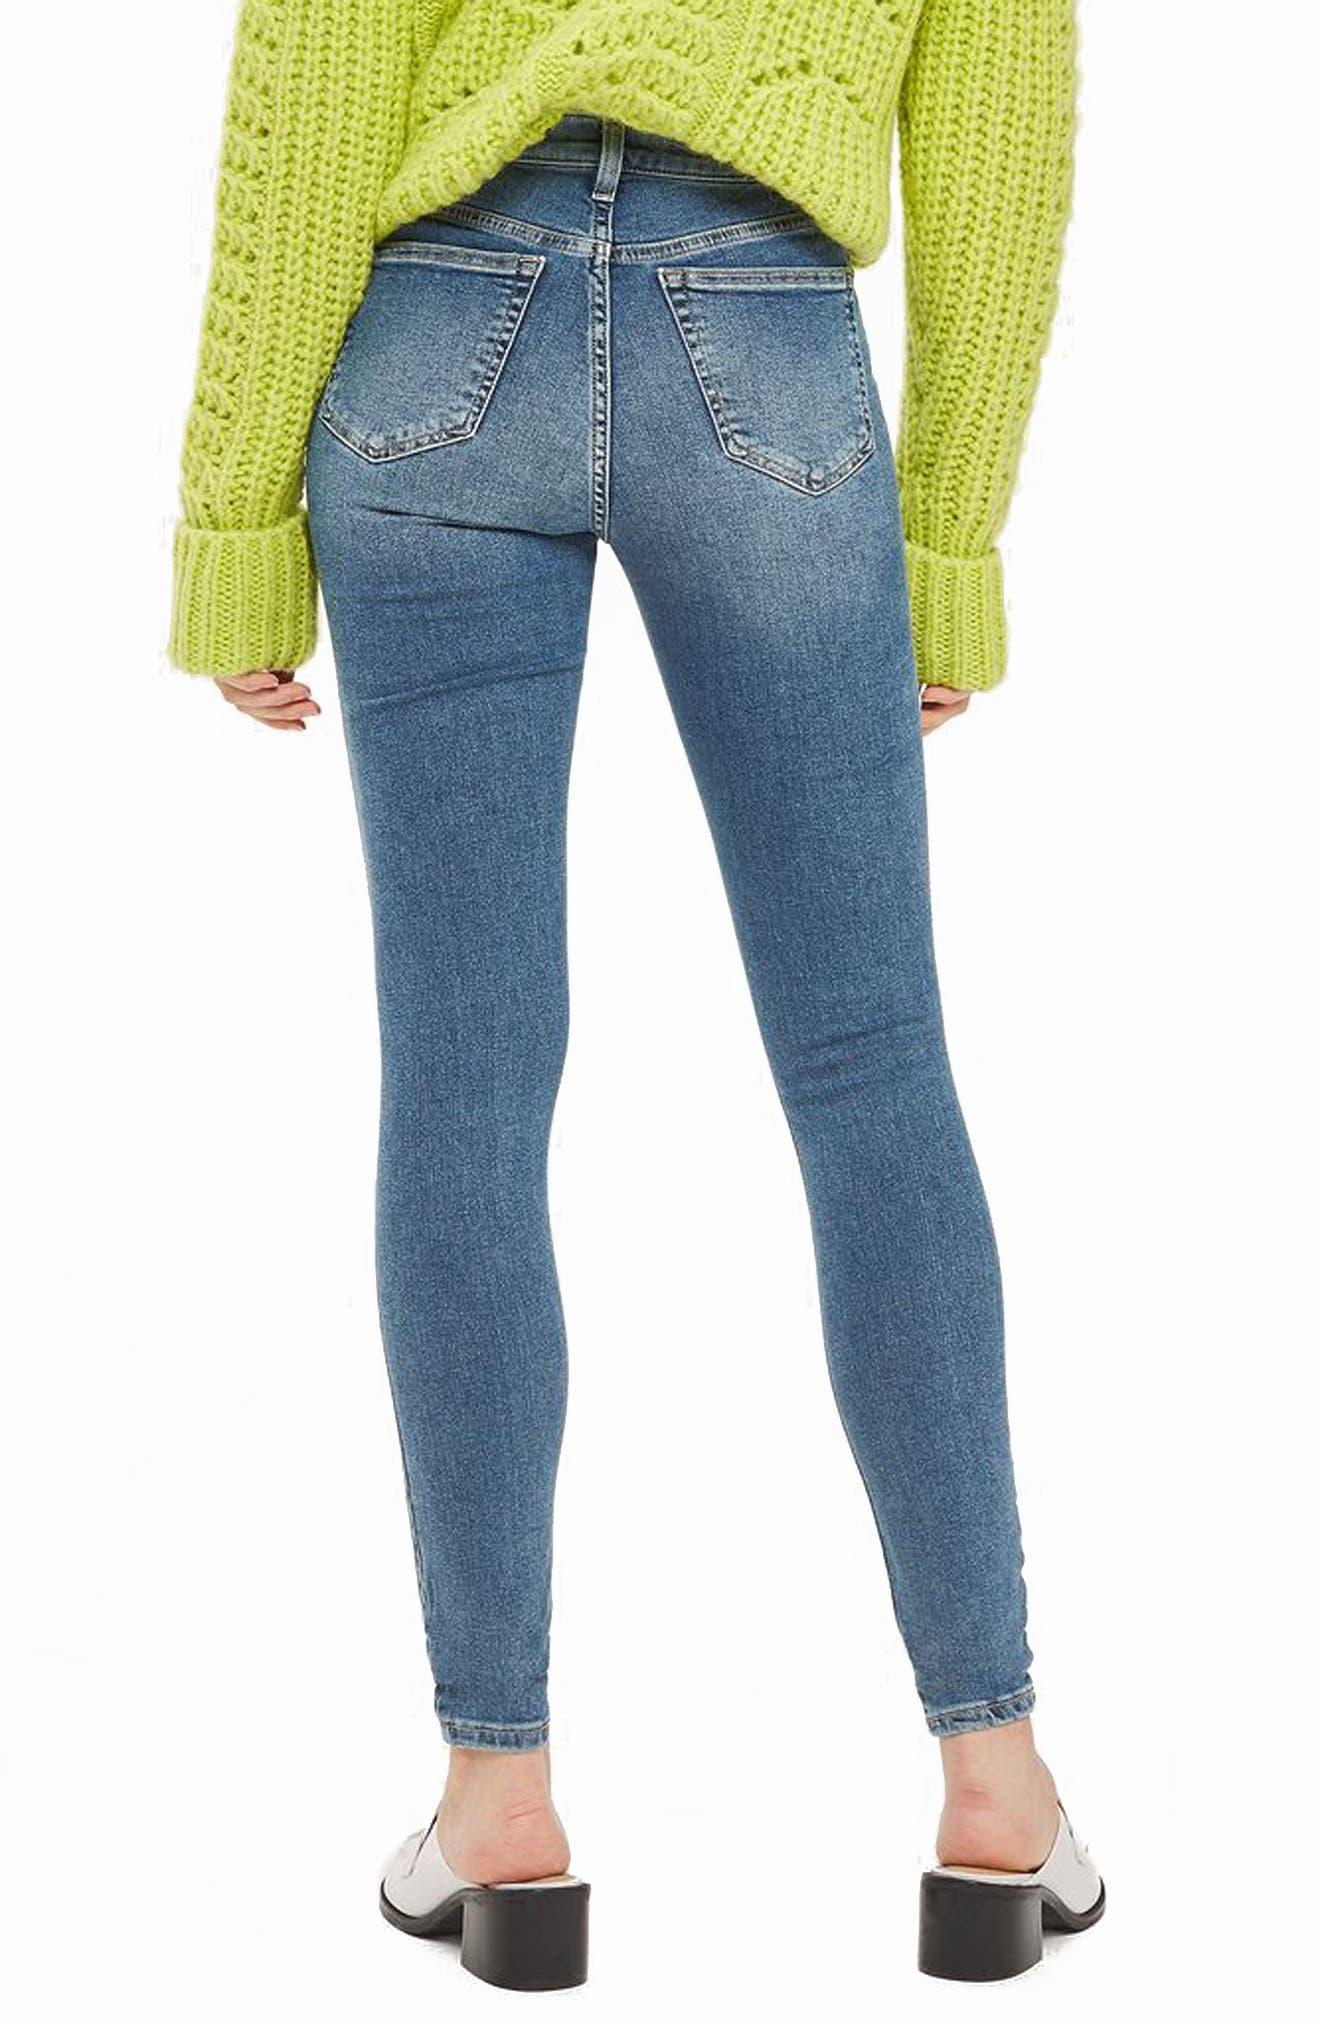 Jamie Rip High Waist Skinny Jeans,                             Alternate thumbnail 3, color,                             Mid Denim